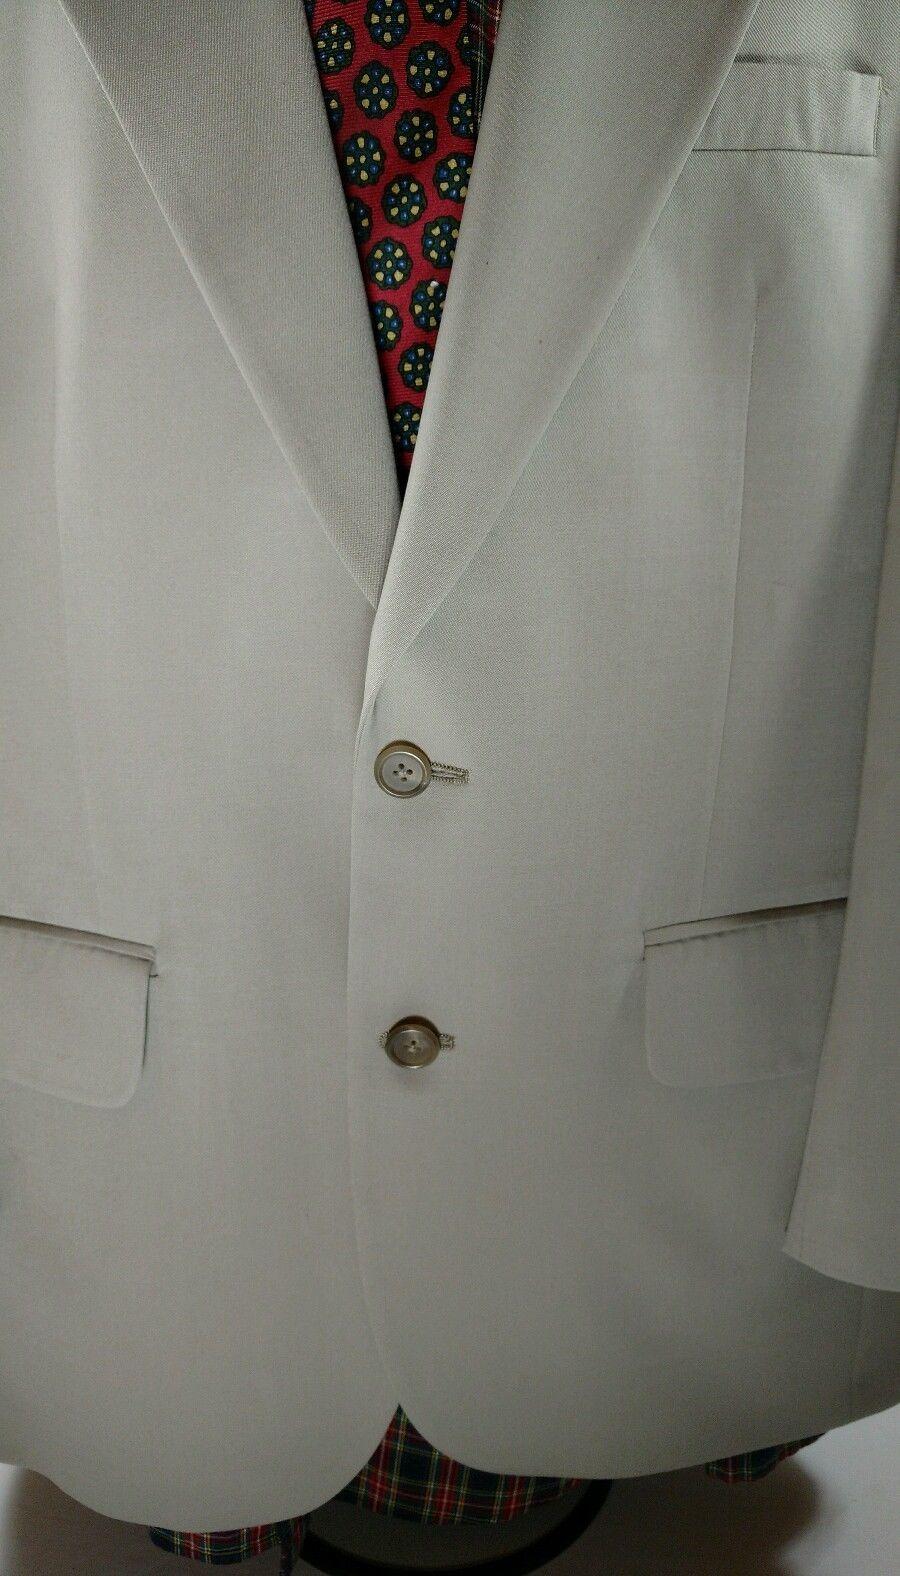 Burberry Mens Wool Sports Coat Suit Jacket 2 Button Blazer 40R? Beige Lt Brown